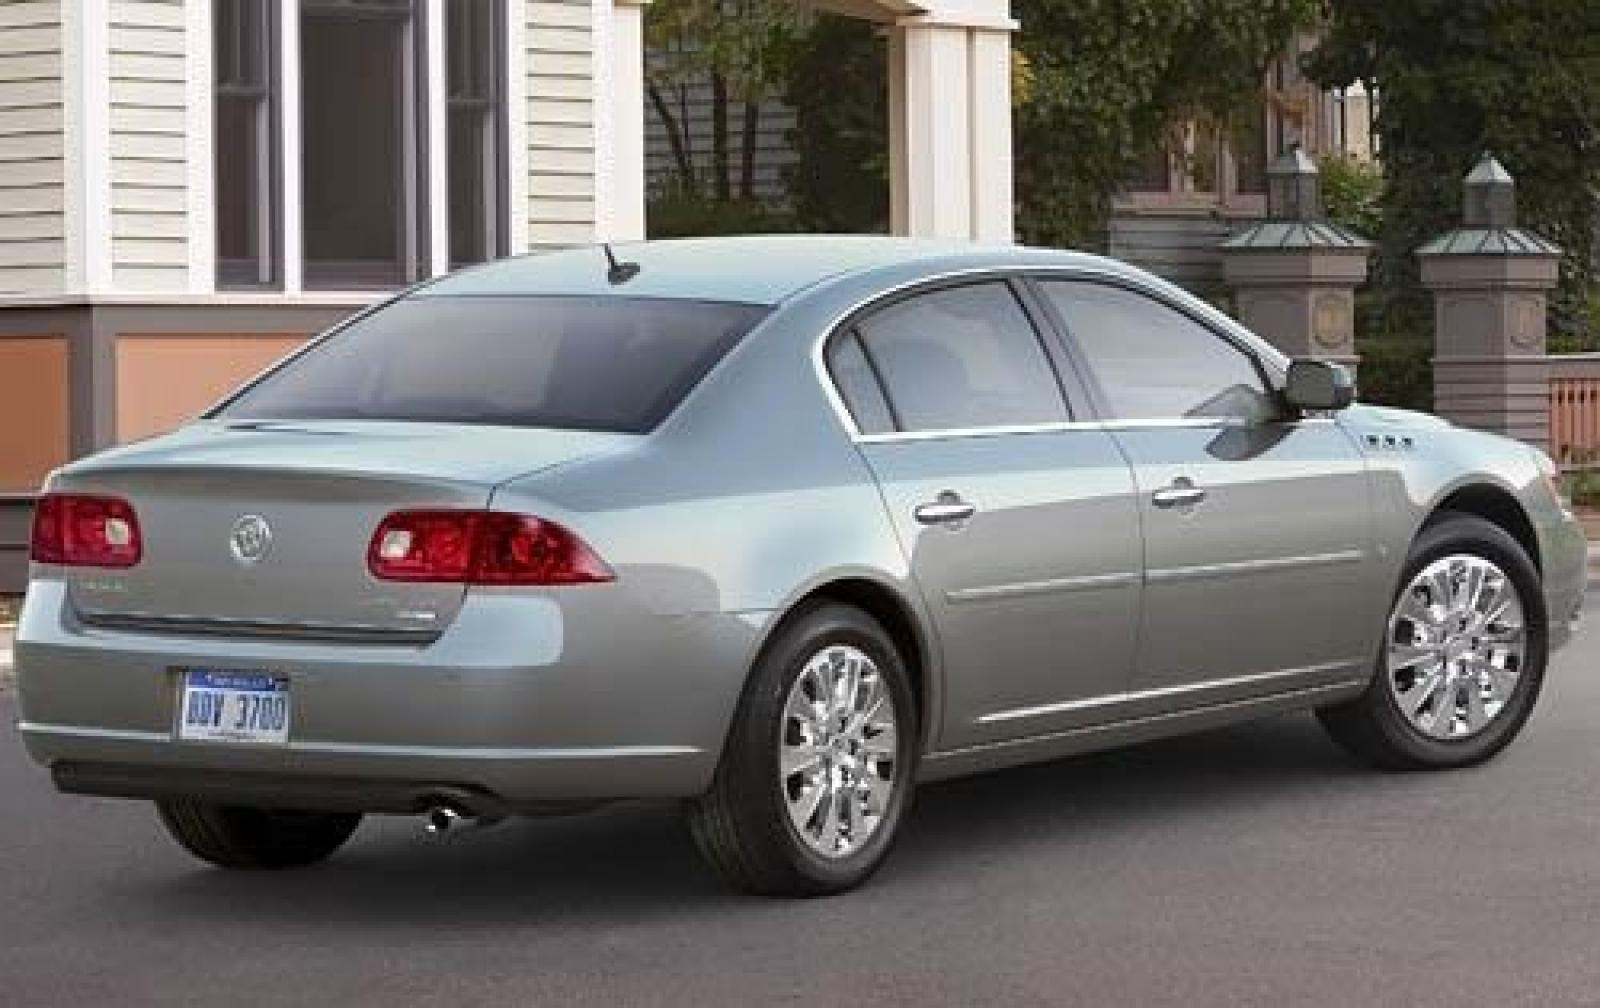 buick hot percent panel instrument cxl up streak premium and gm october sedan lucerne sales on news gmc in